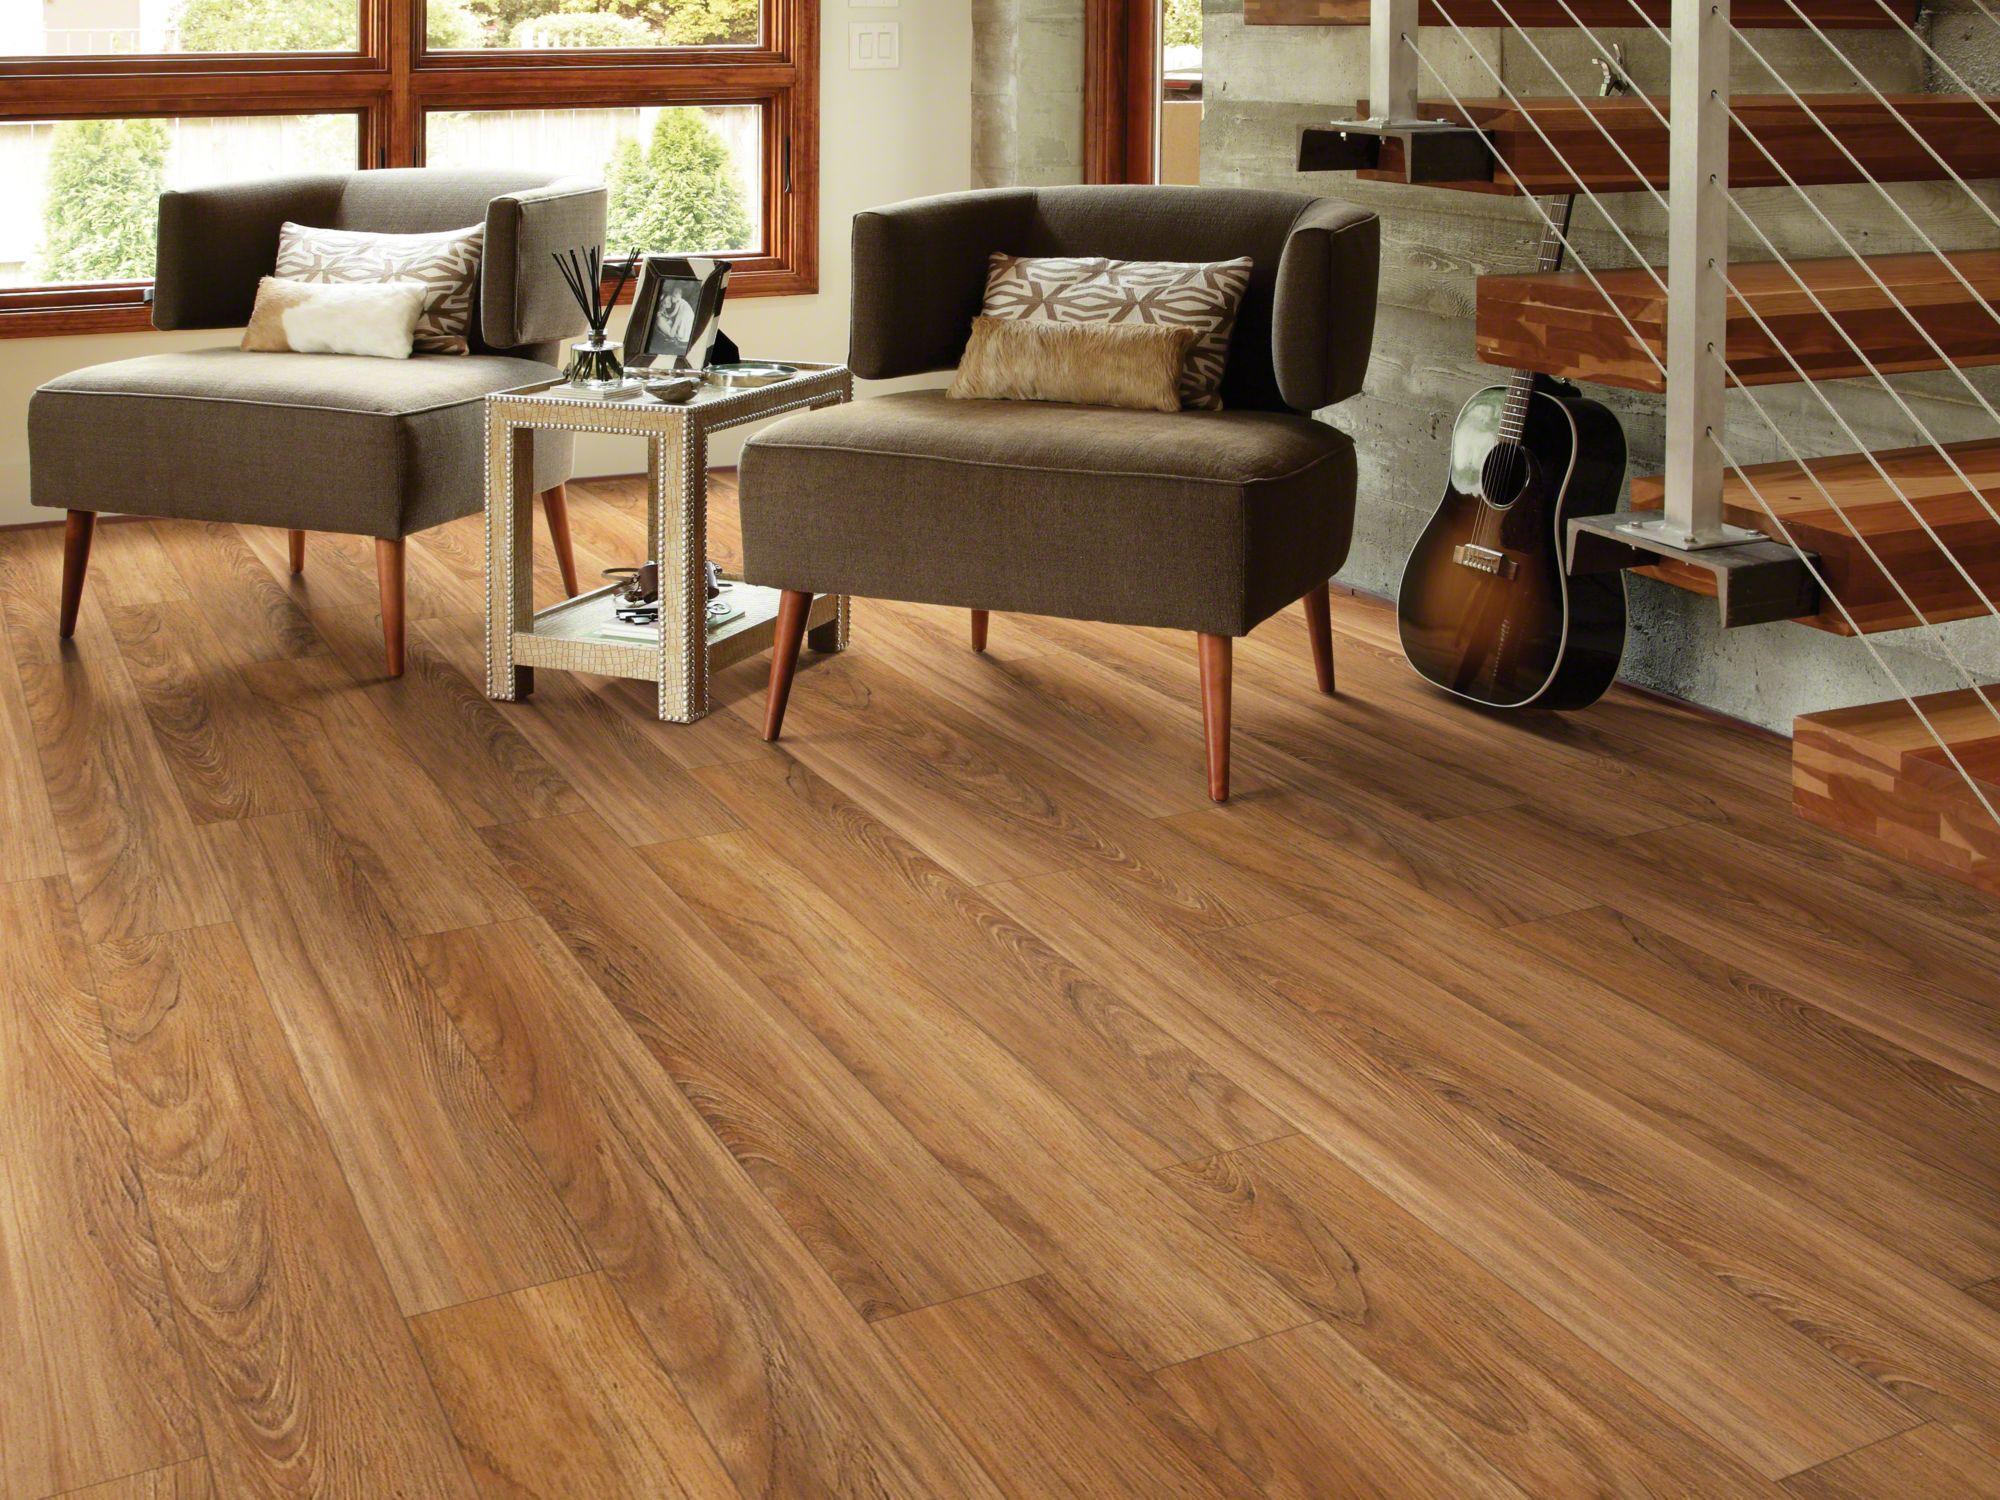 Is teak flooring worth the investment?